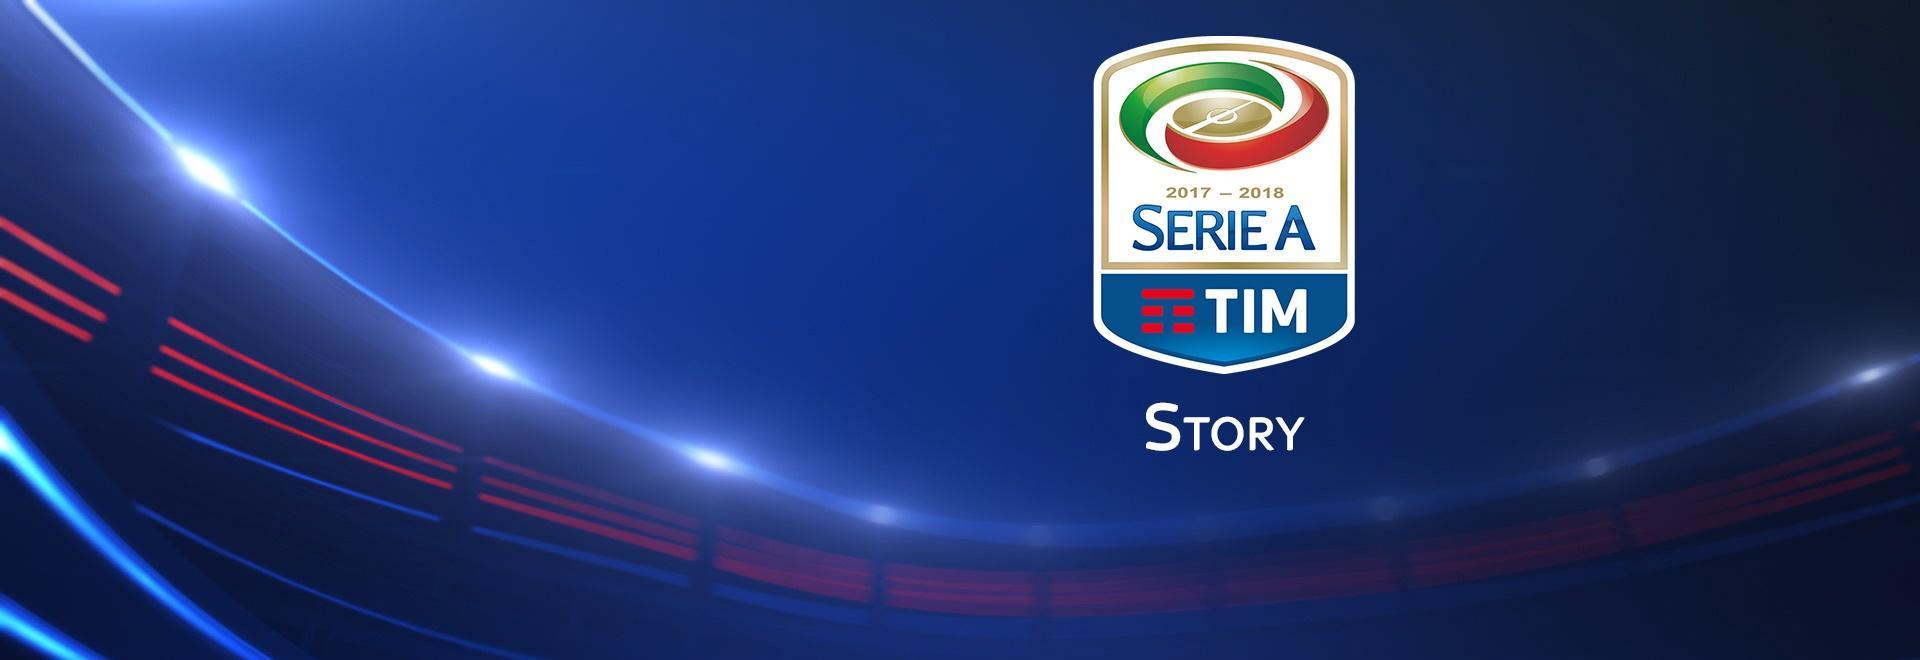 Serie A Story - Milan - Inter 04/05/14